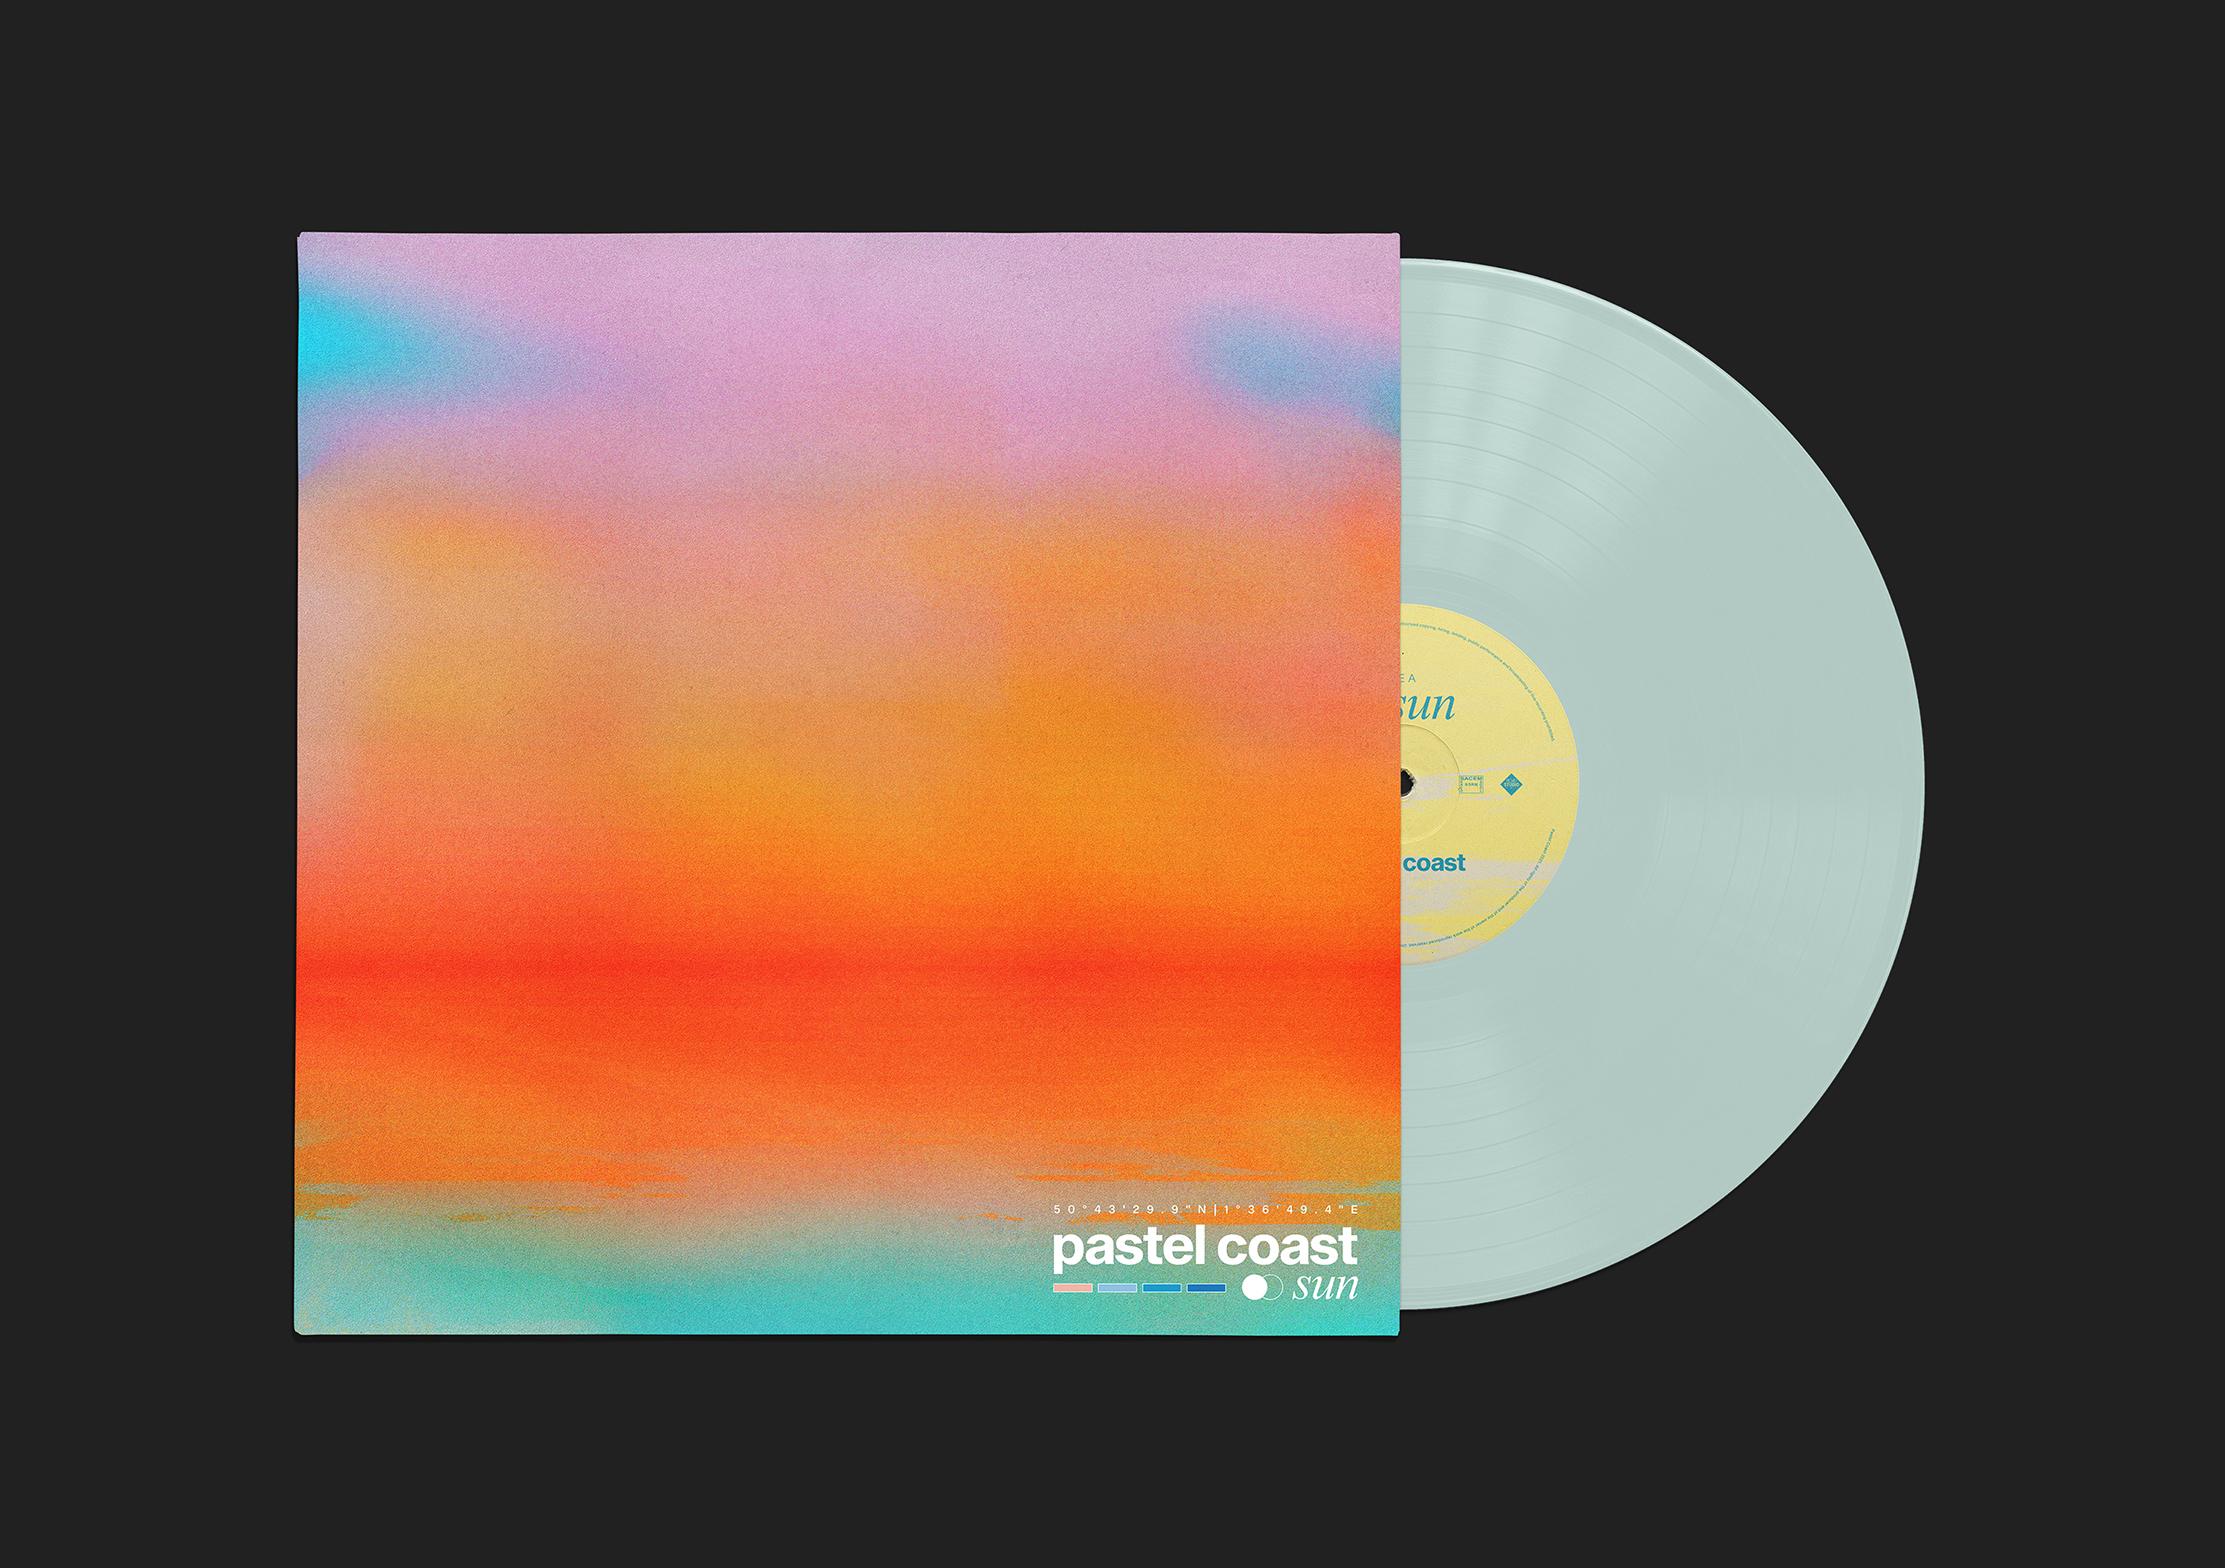 PASTEL-vinyl-record-mockup